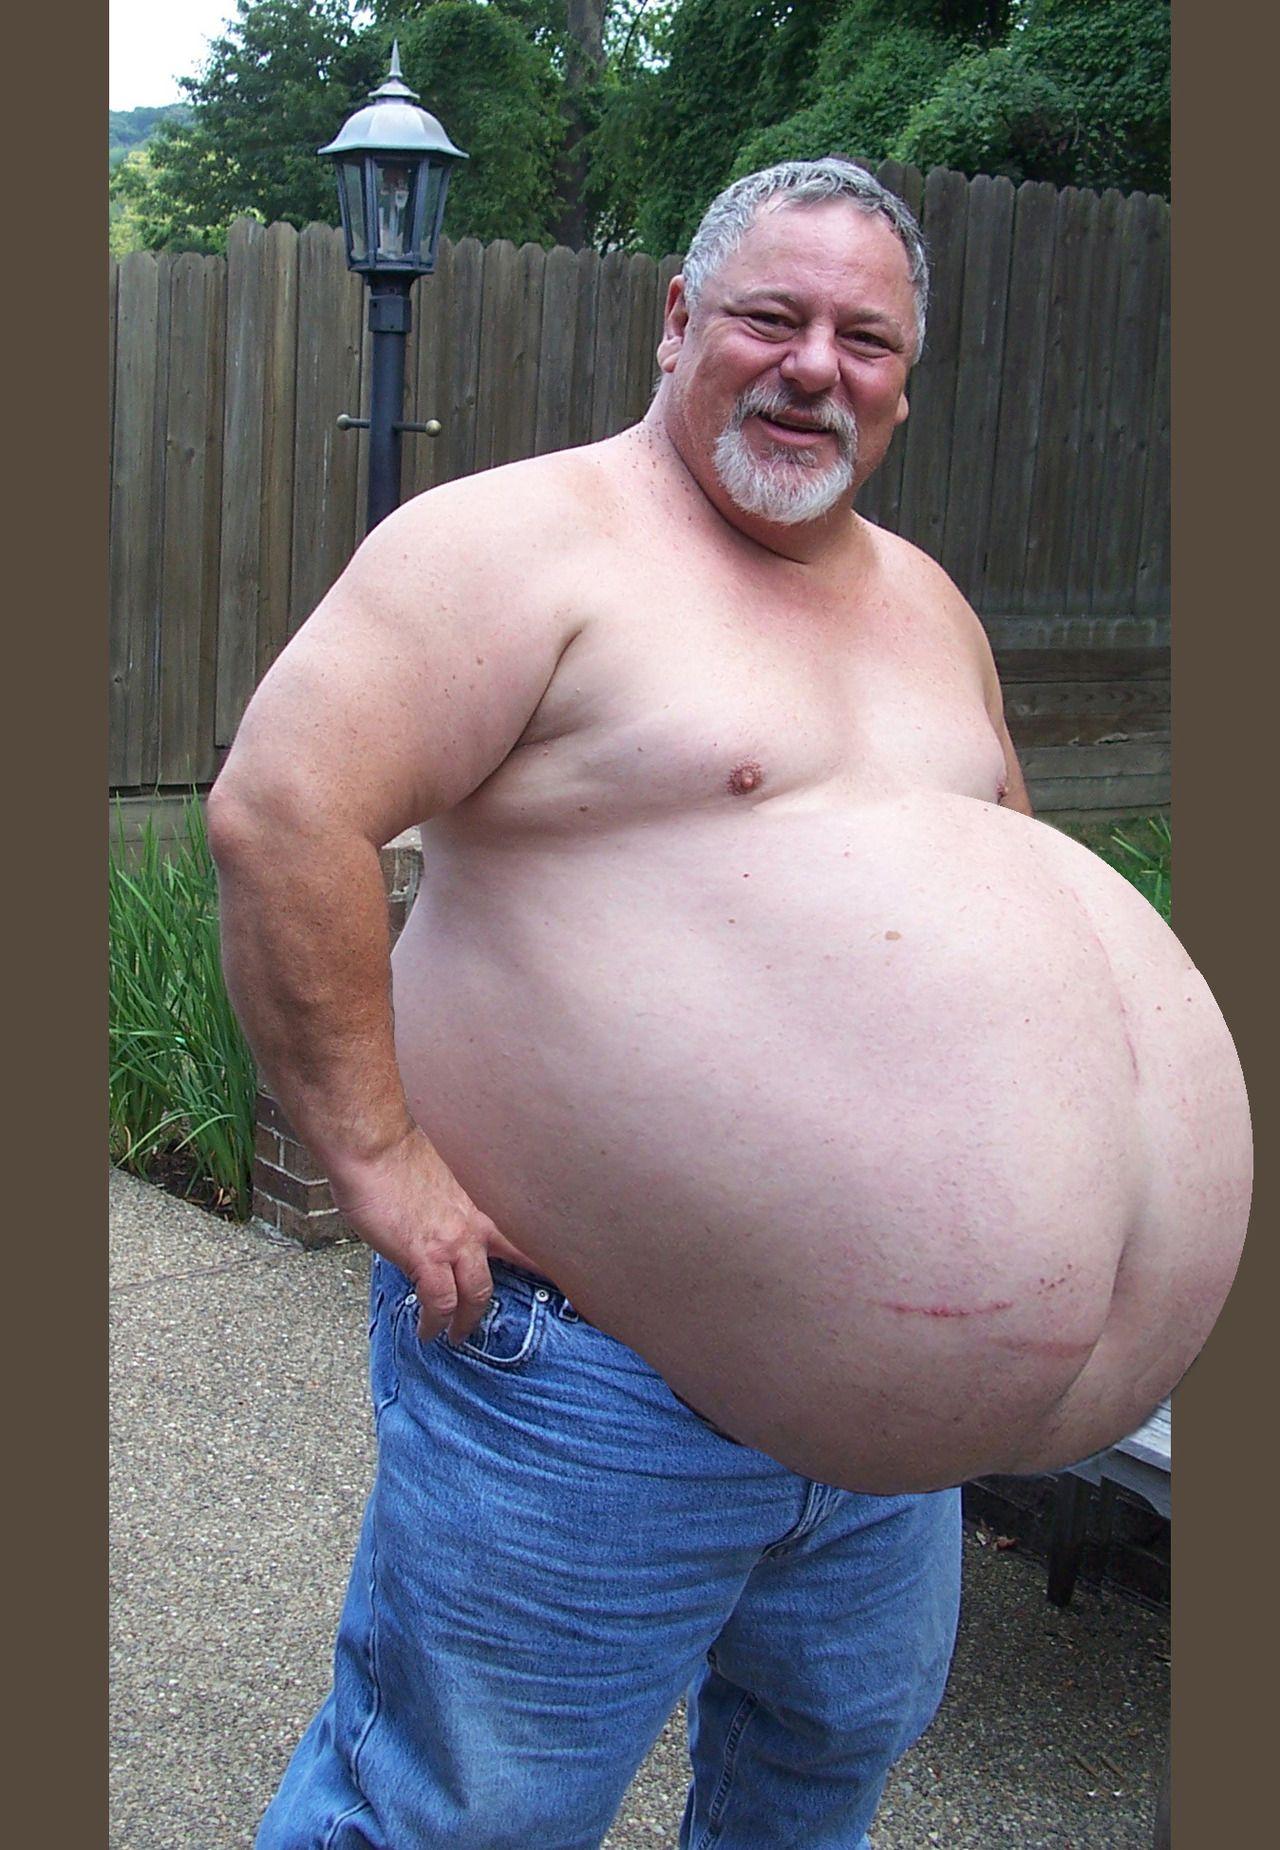 worshipfatdaddies | Big belly, How to make, Belly